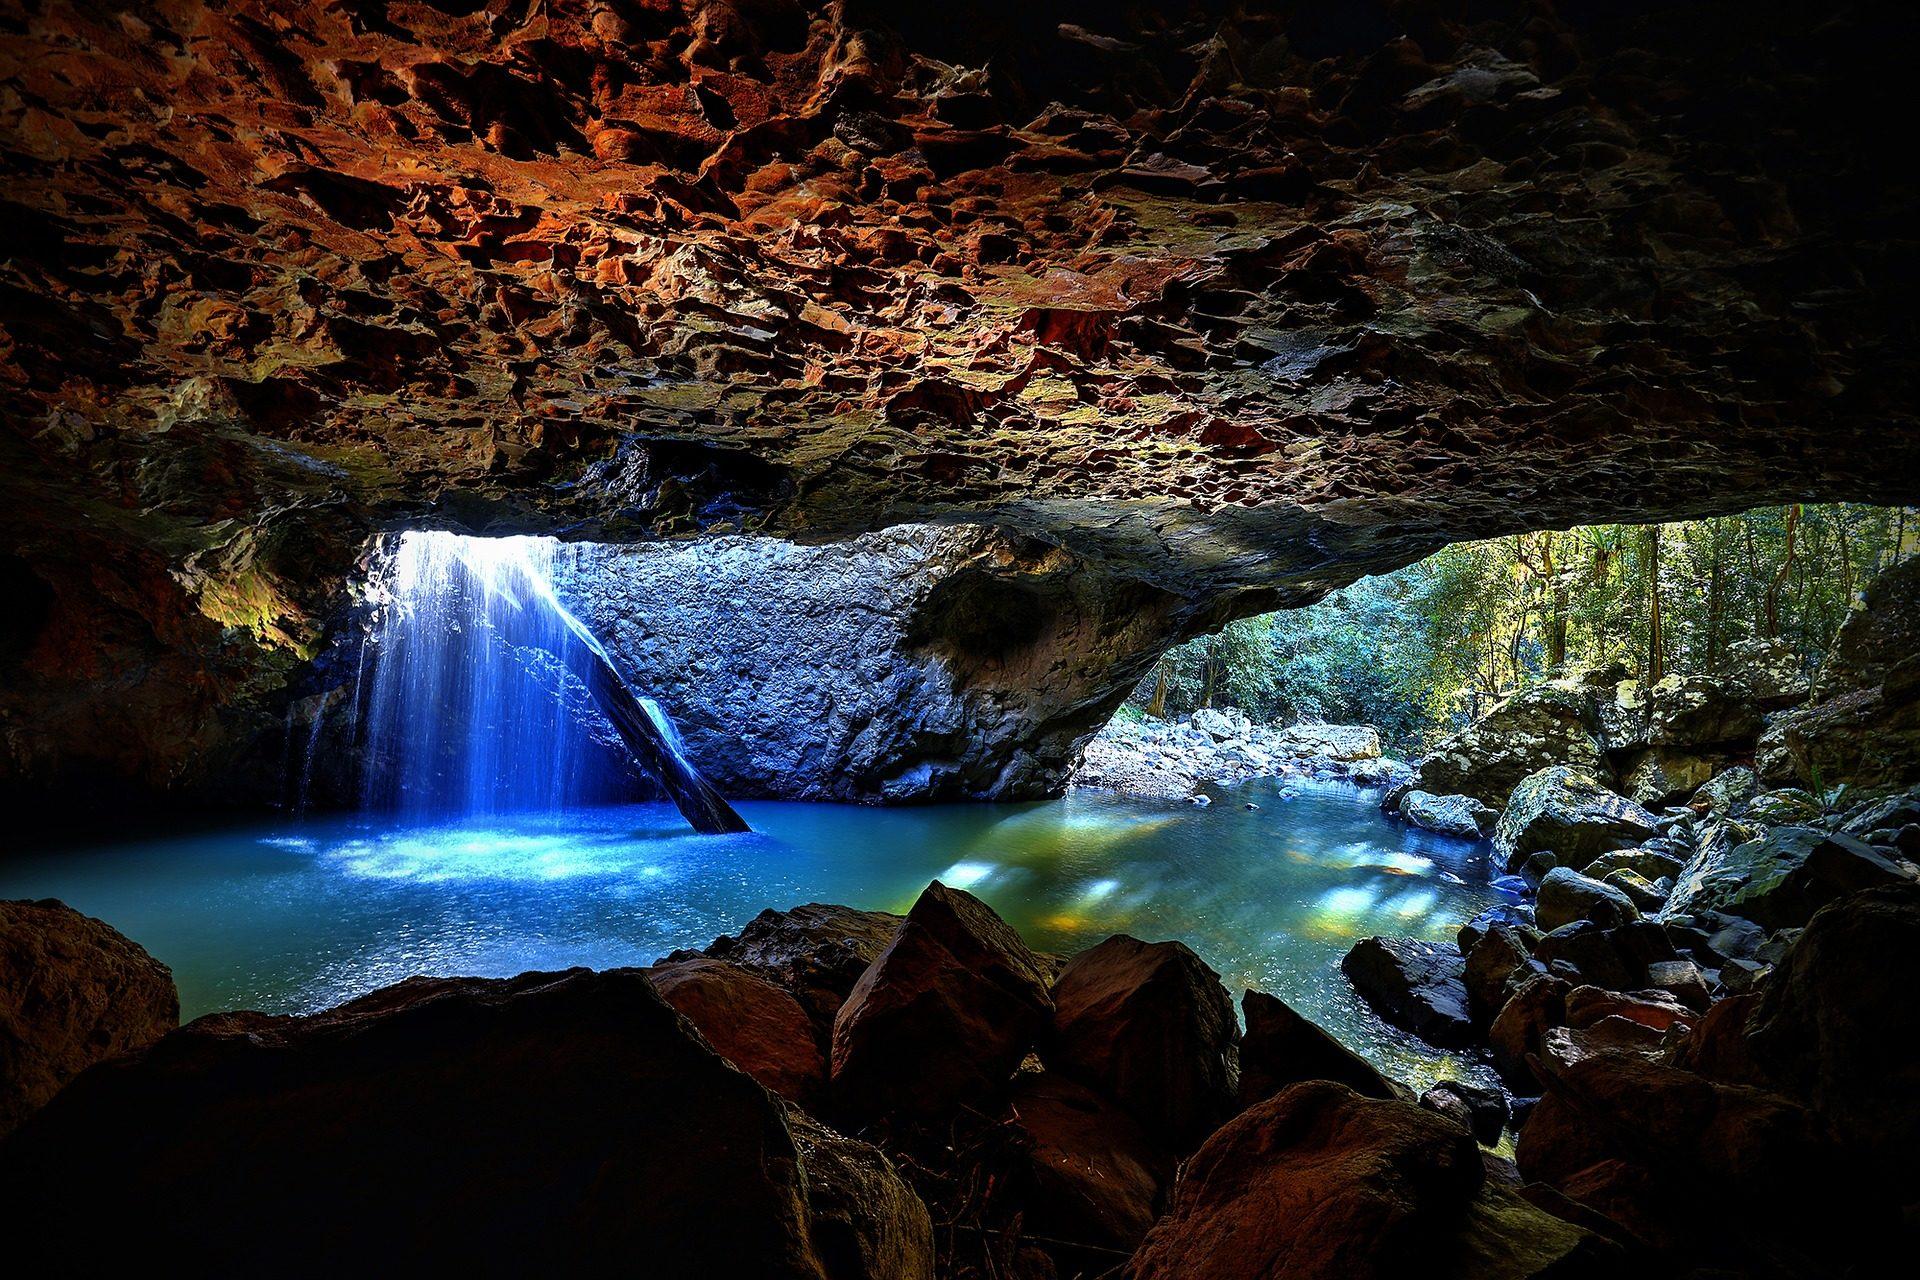 cueva, Cavern, Rocas, acqua, Brisbane, Australia - Sfondi HD - Professor-falken.com